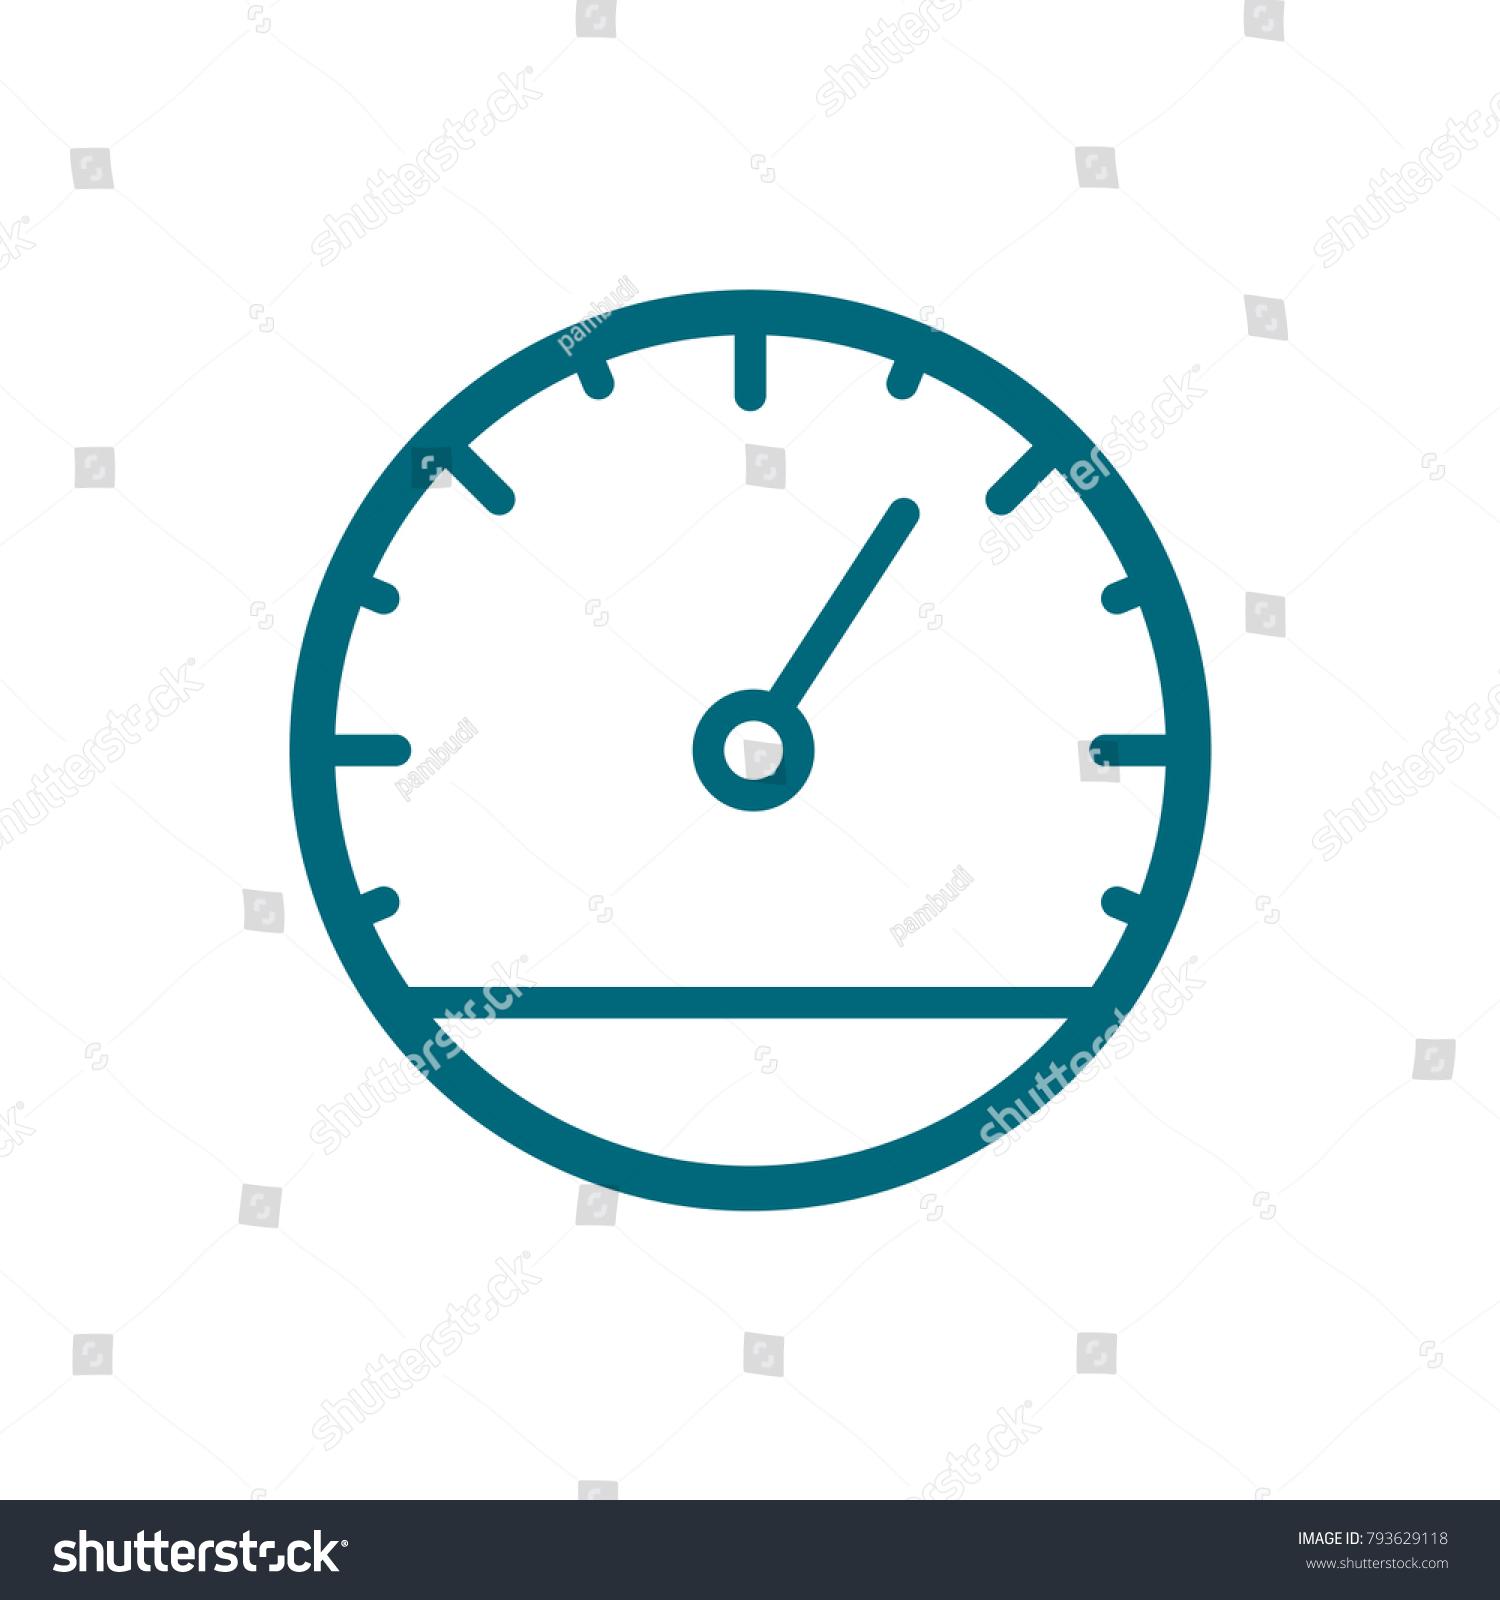 speedometer vector icon speedometer icon trendy stock photo photo rh shutterstock com speedometer vector free download car speedometer vector